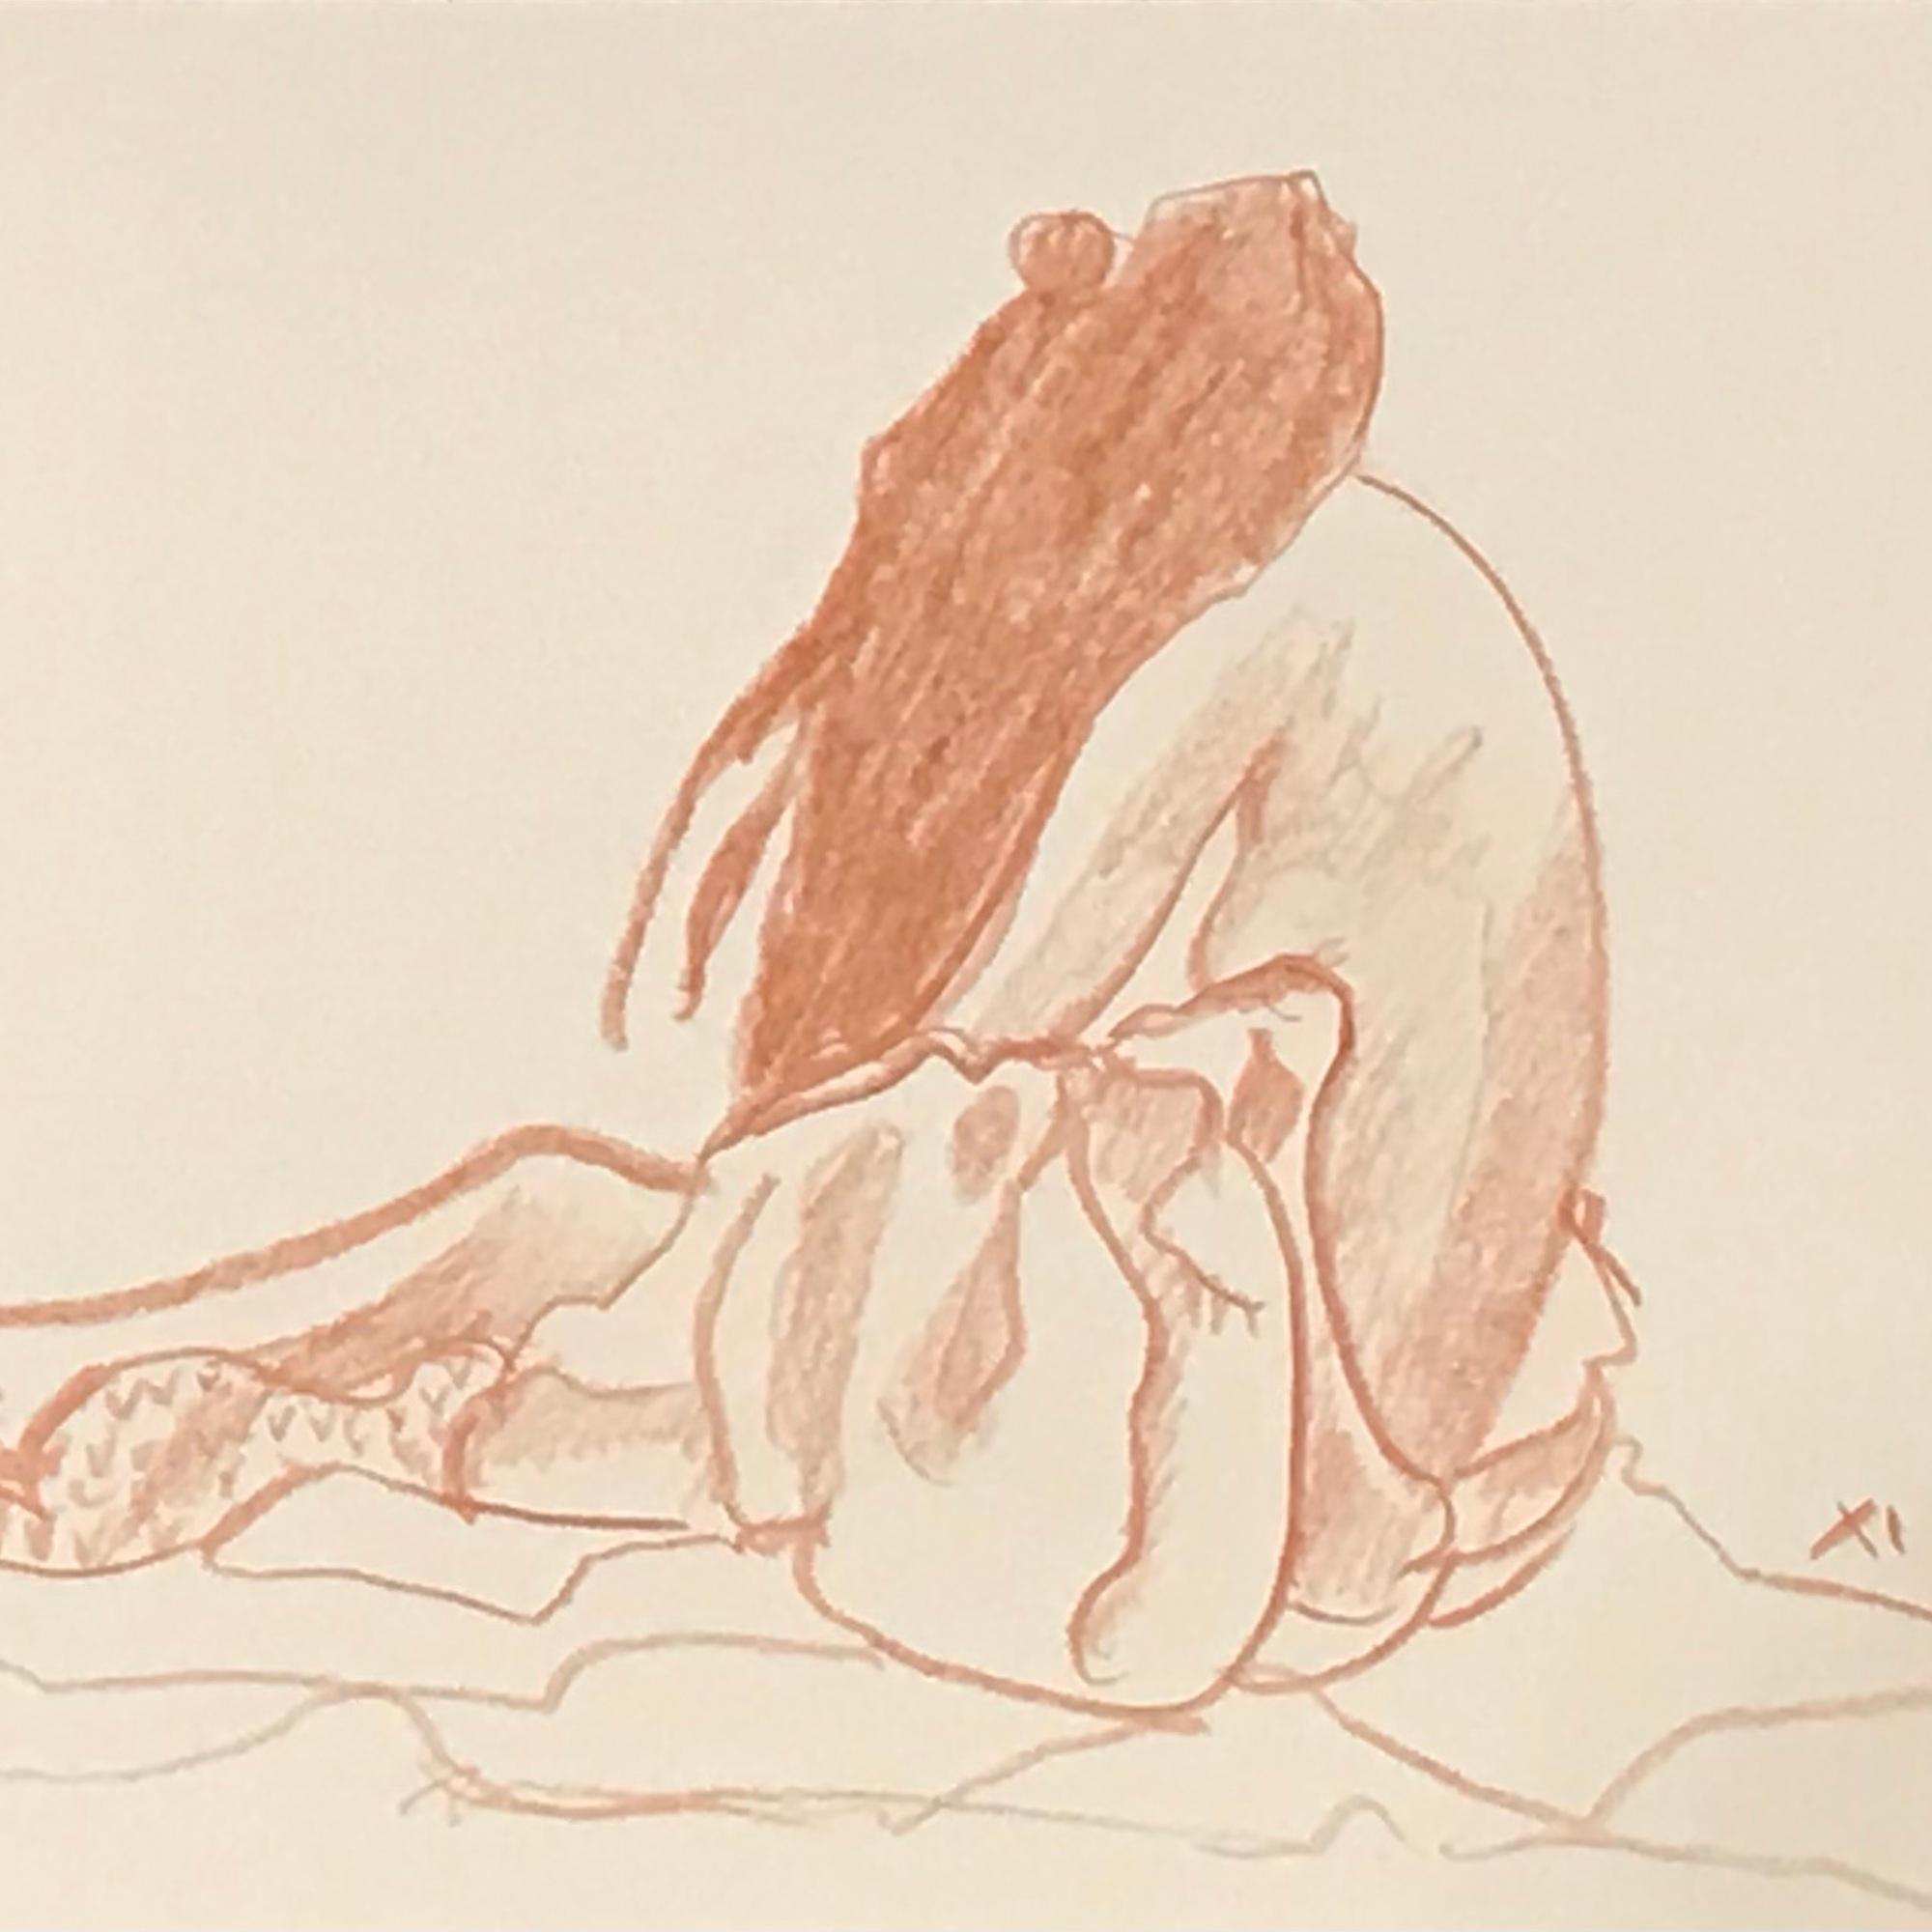 (c) Confais Nu drapé Draped Nude dessin sanguine 15x20